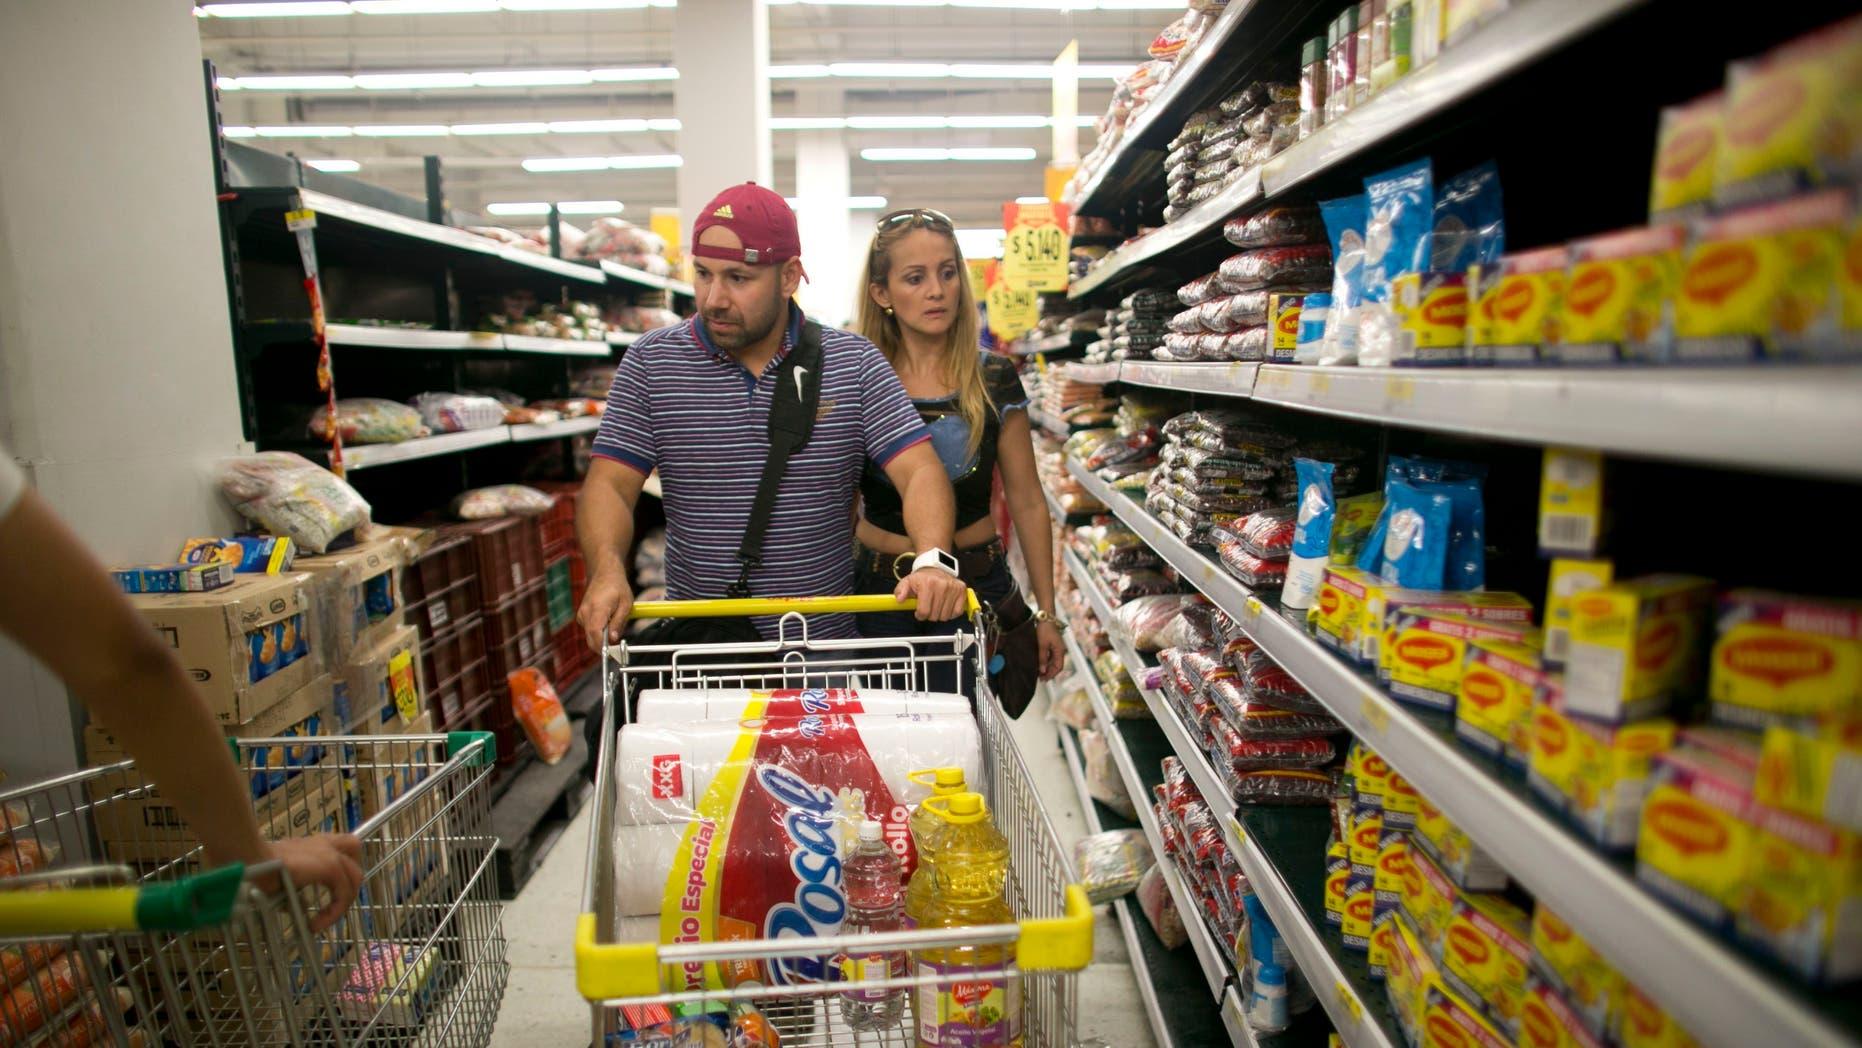 Ramiro and Tebie Gonzalez Ramirez shop for food in Cucuta, Colombia, Sunday, July 17, 2016.